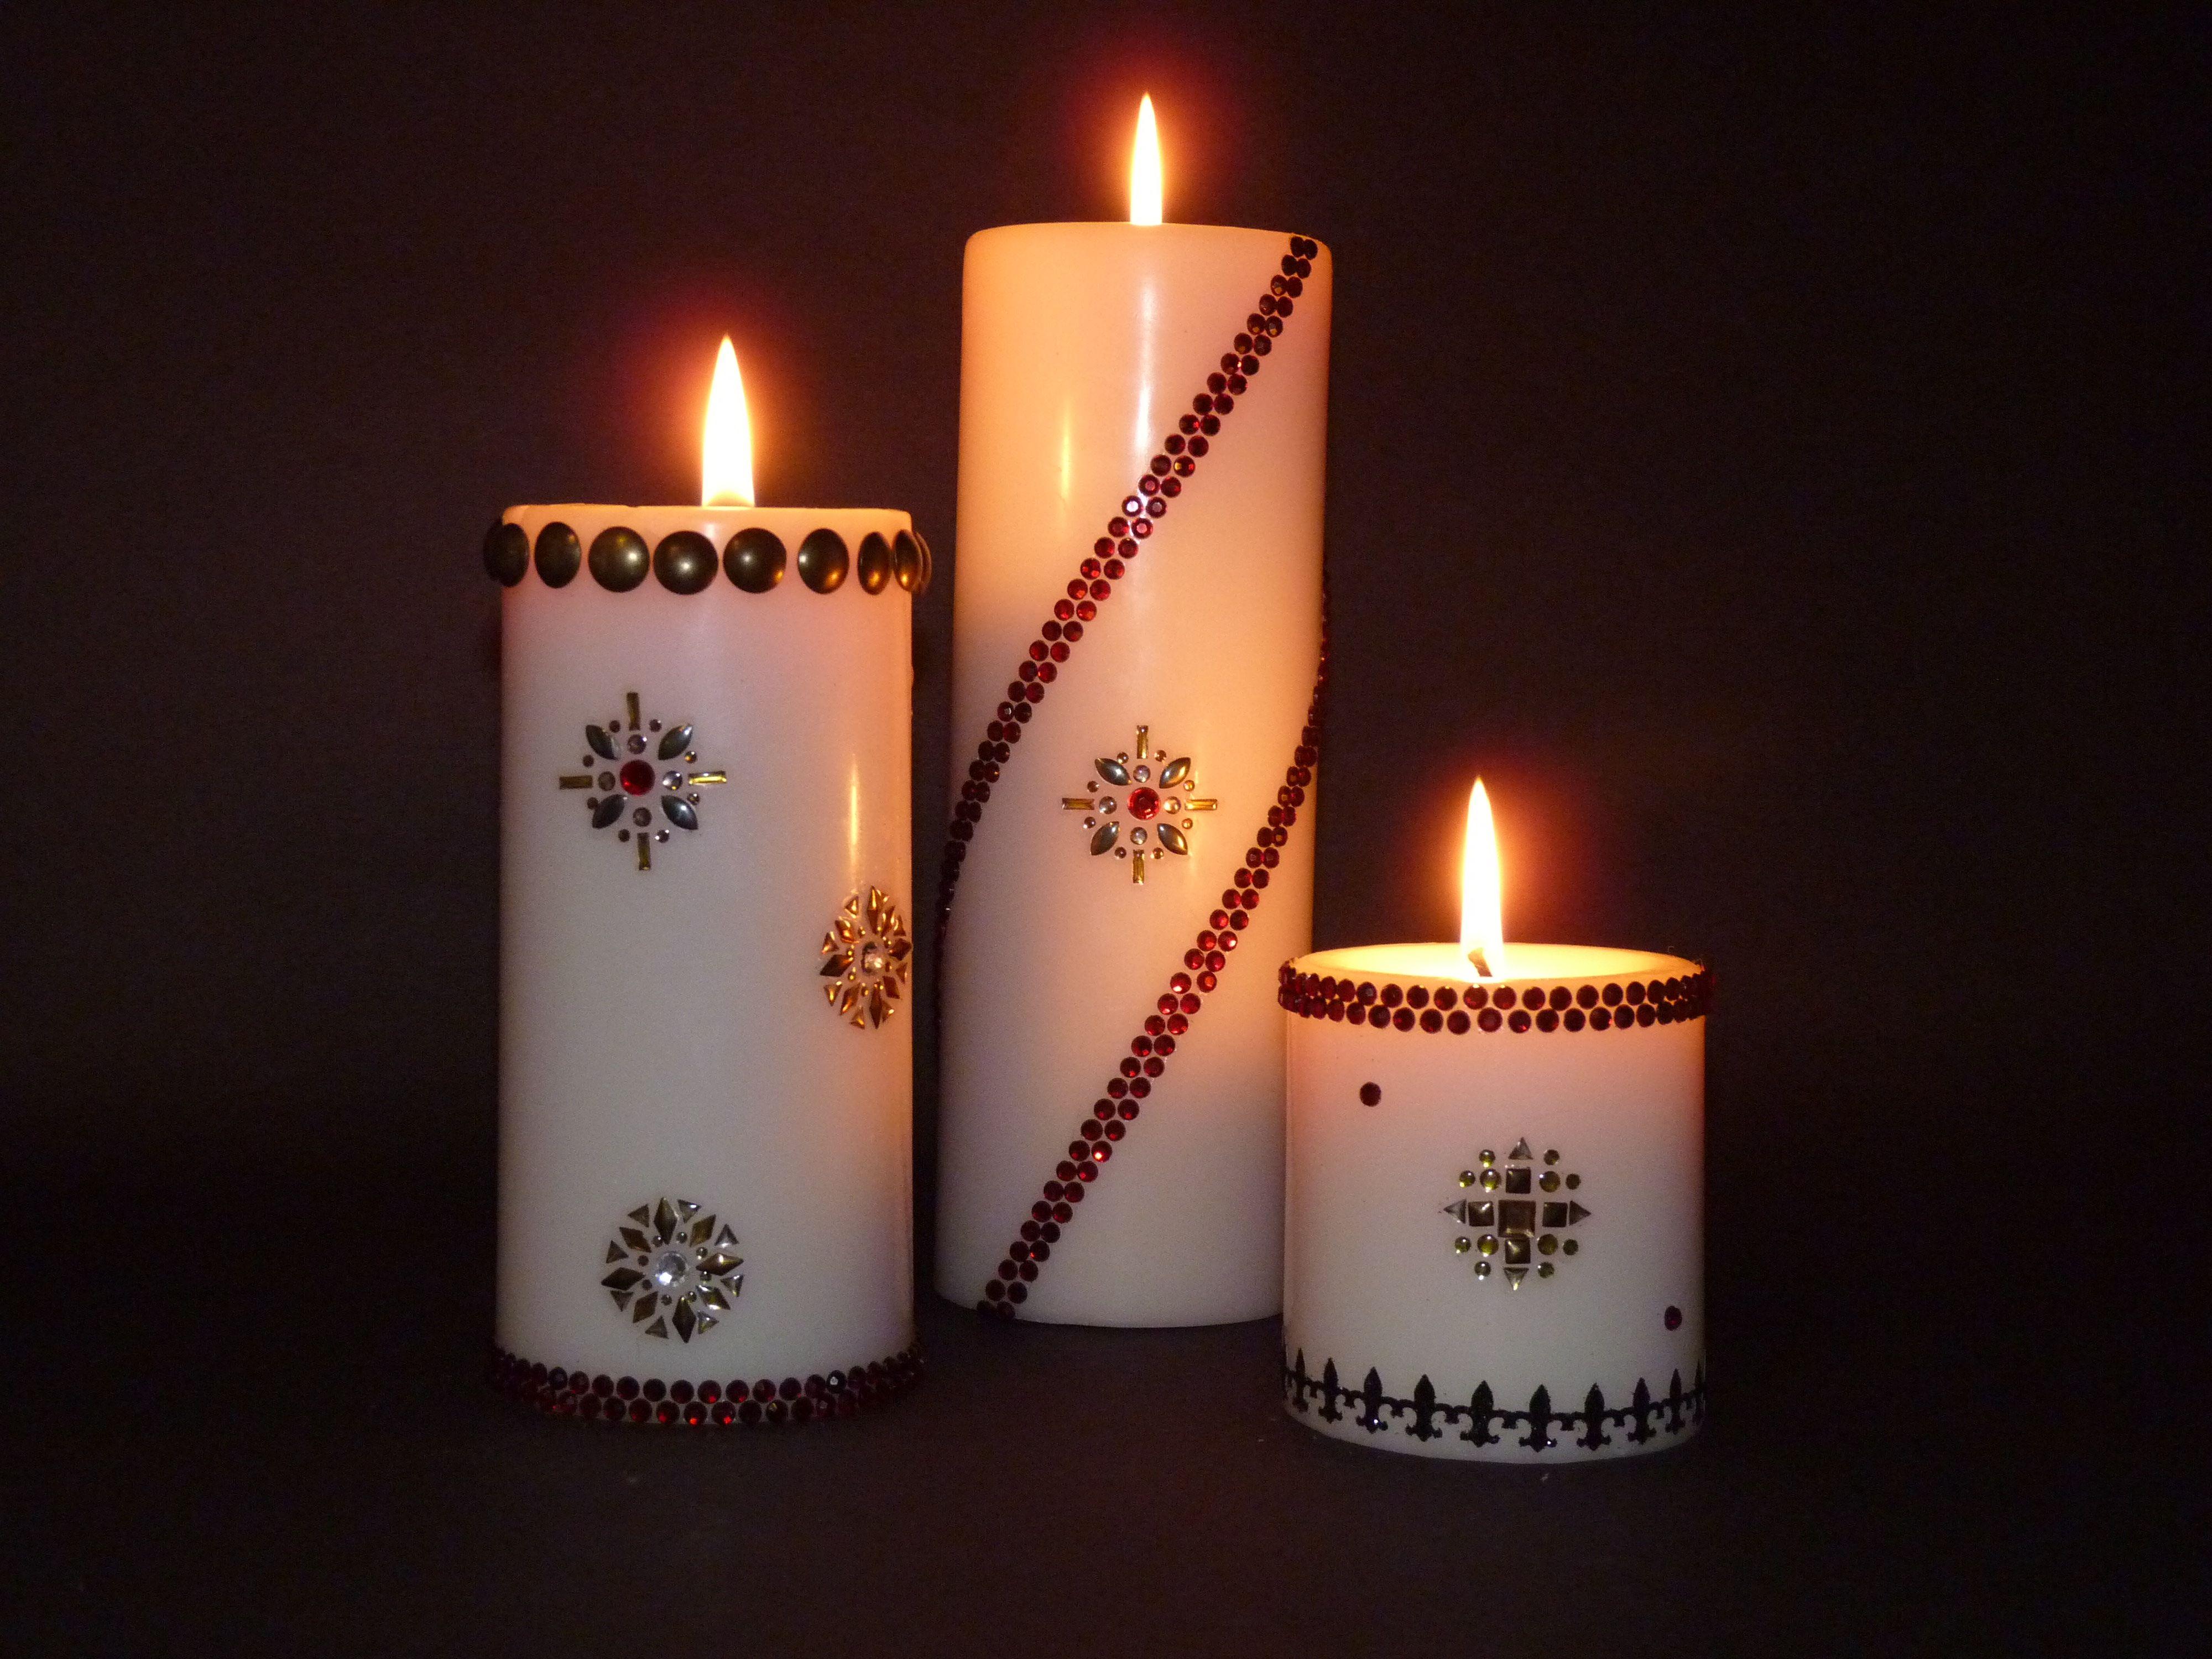 3 Decorative Pillar Candles Design Ideas